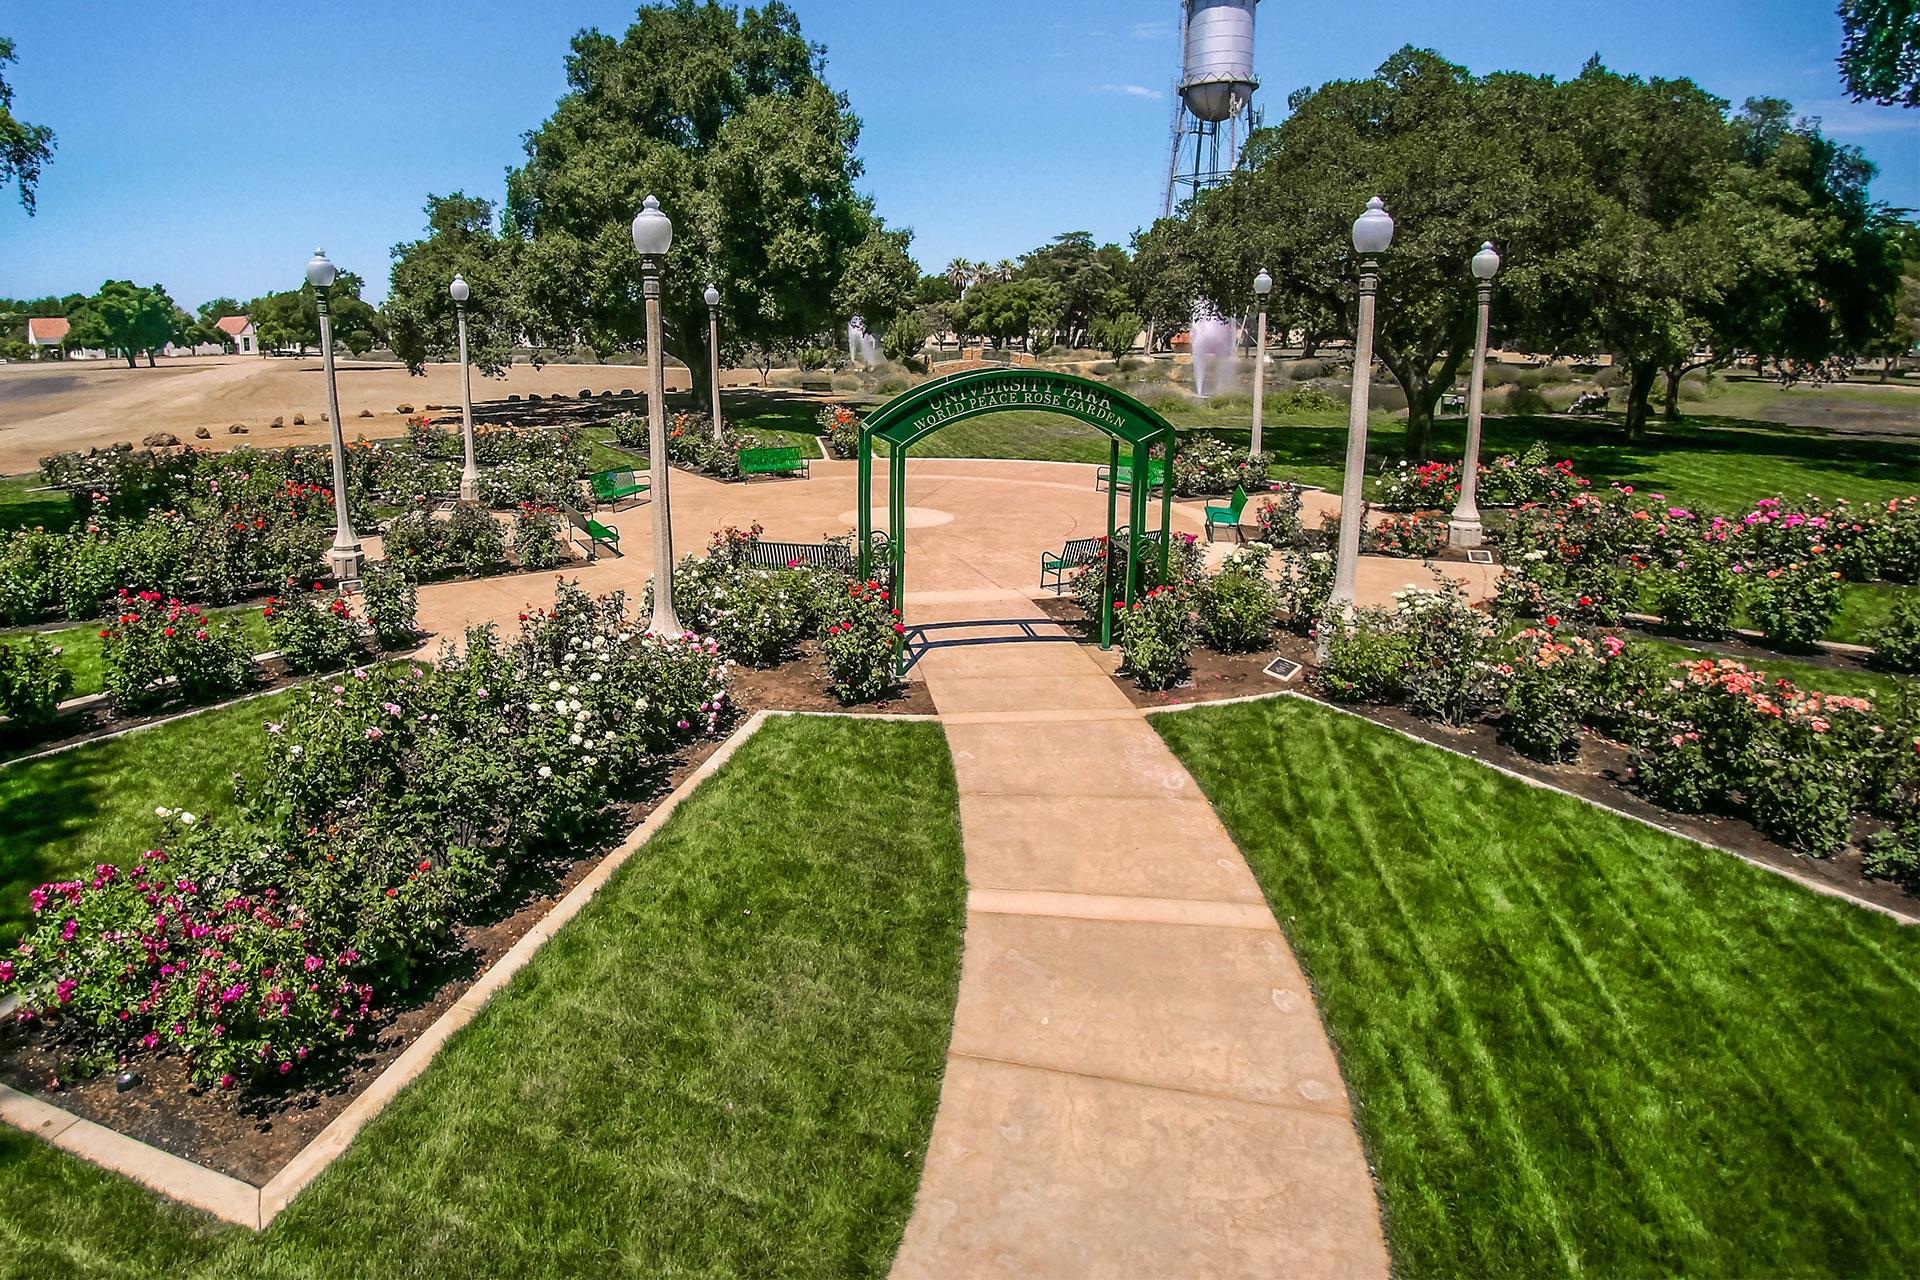 rose-garden-university-park-image1 (1)